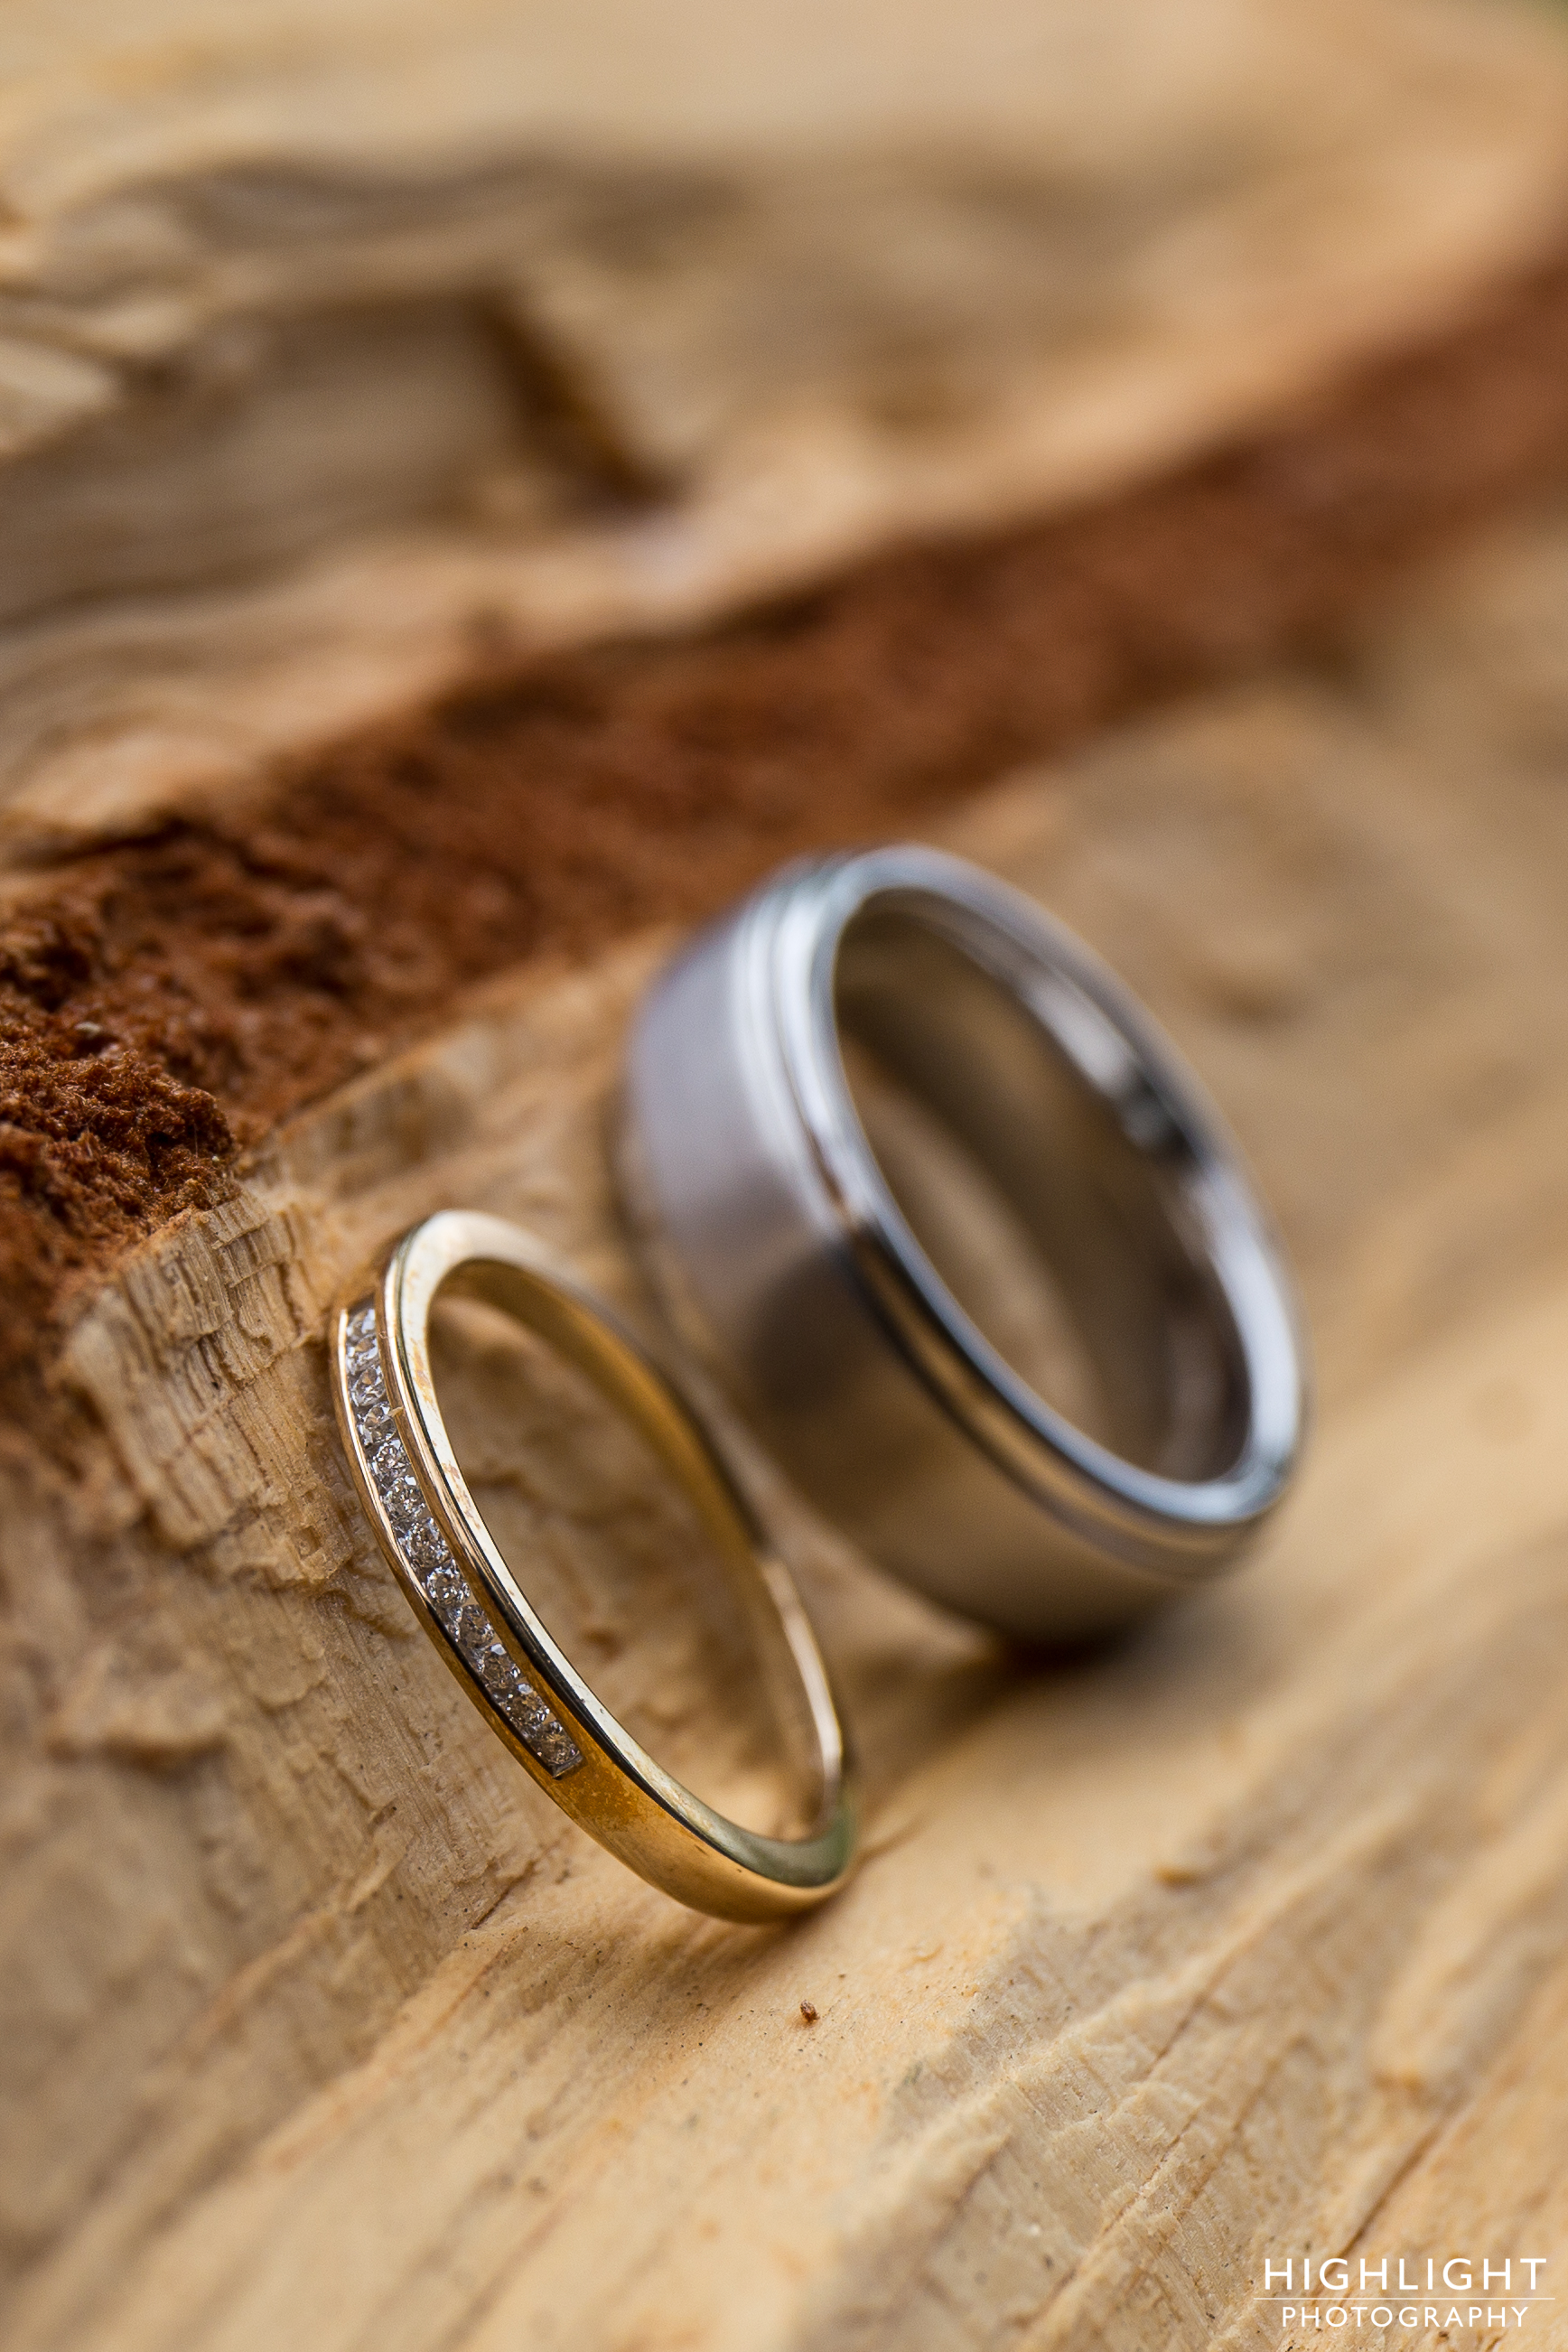 mj-highlight-wedding-photography-palmerston-north-manawatu